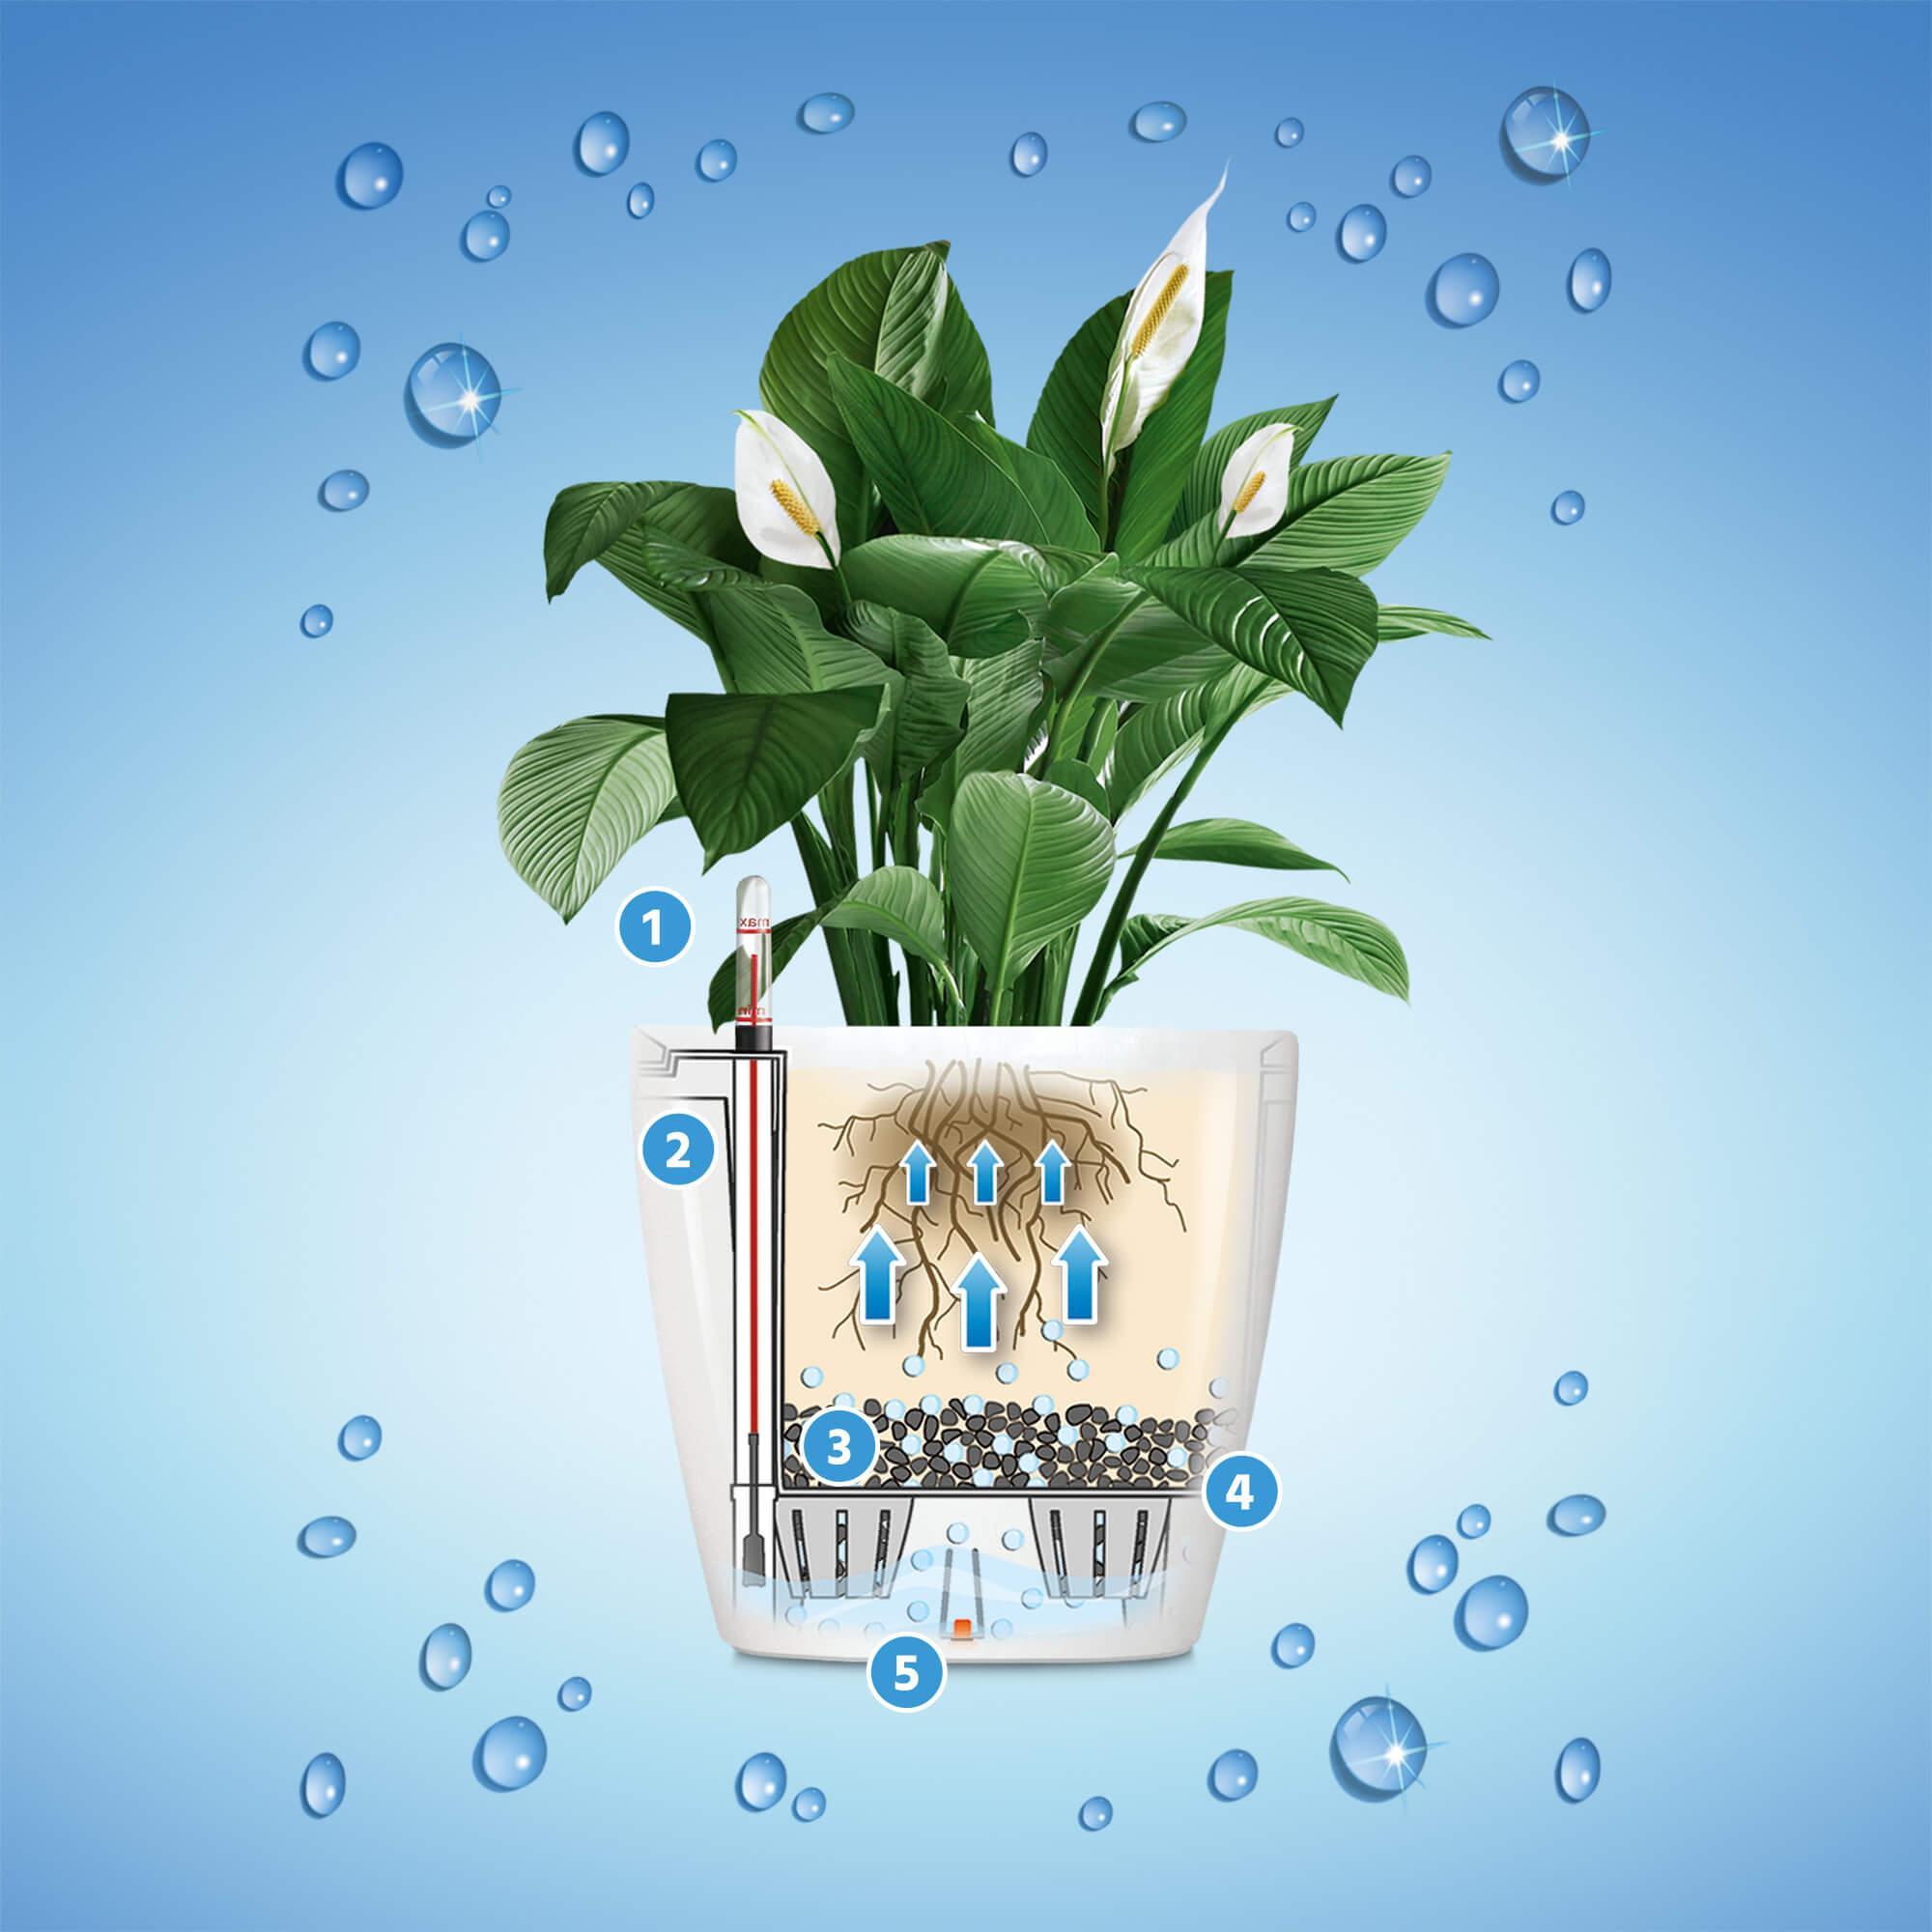 le_sub-irrigation-system